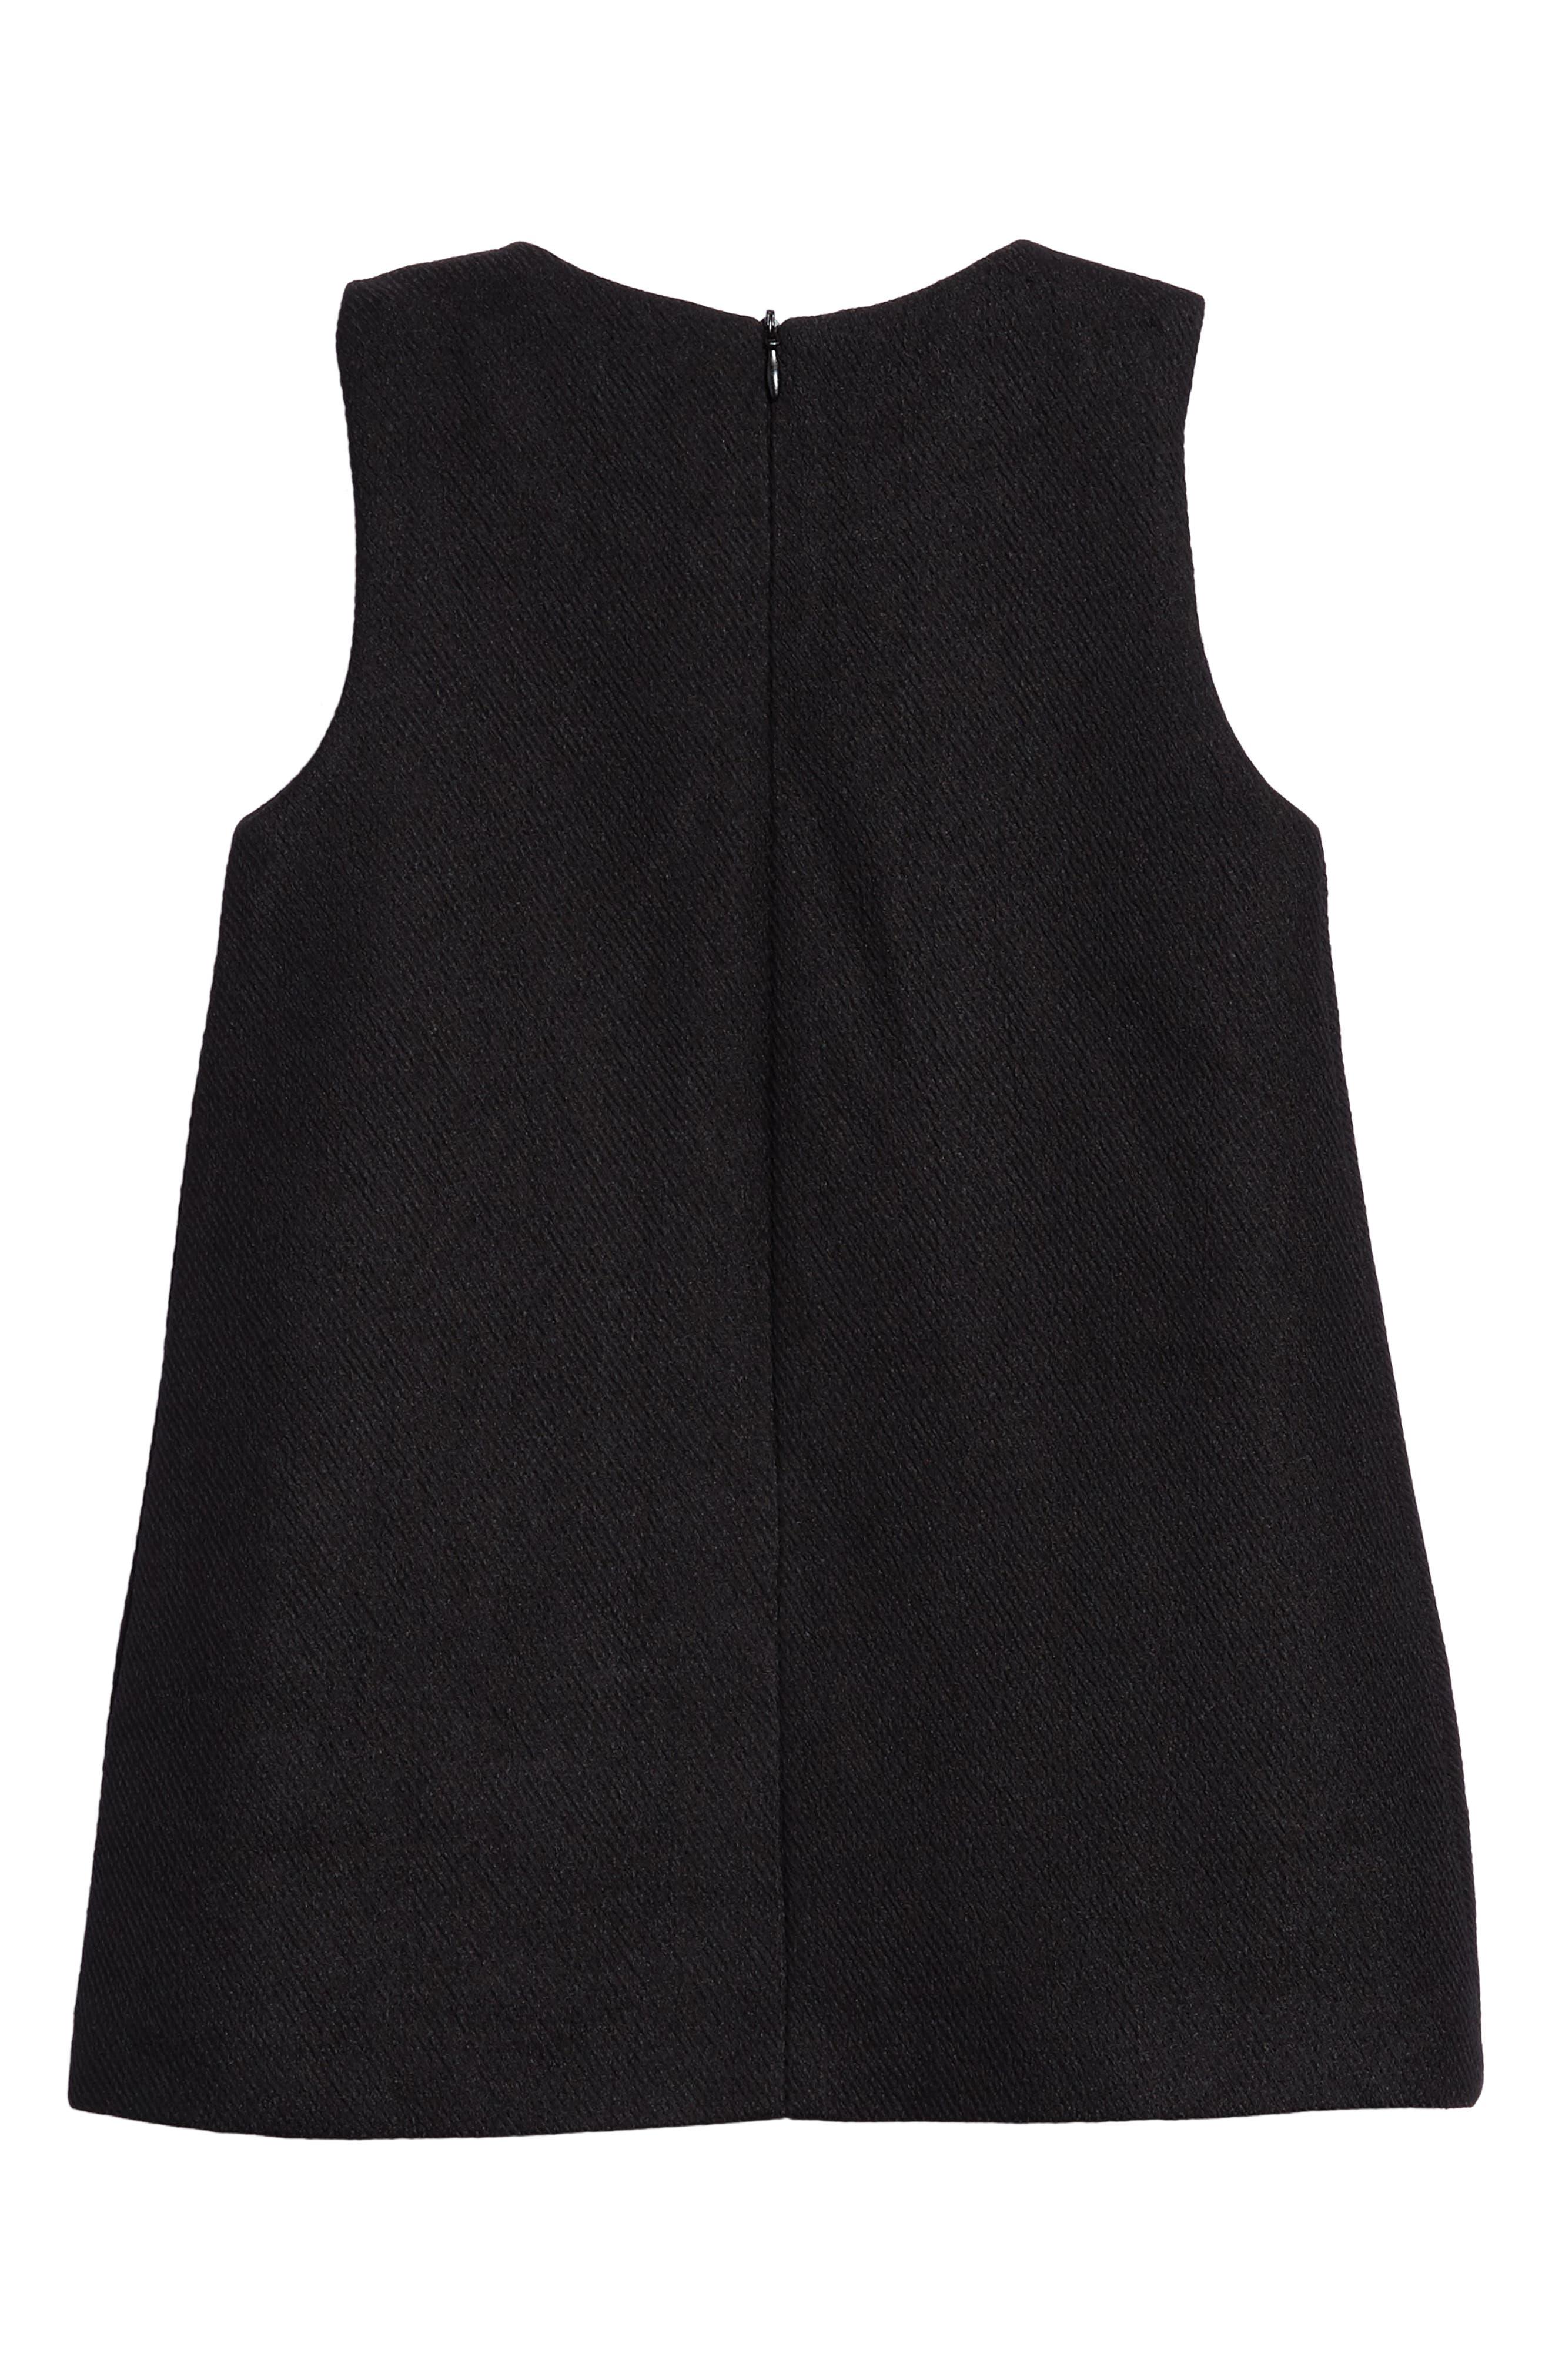 Mod Sleeveless Shift Dress,                             Alternate thumbnail 2, color,                             001